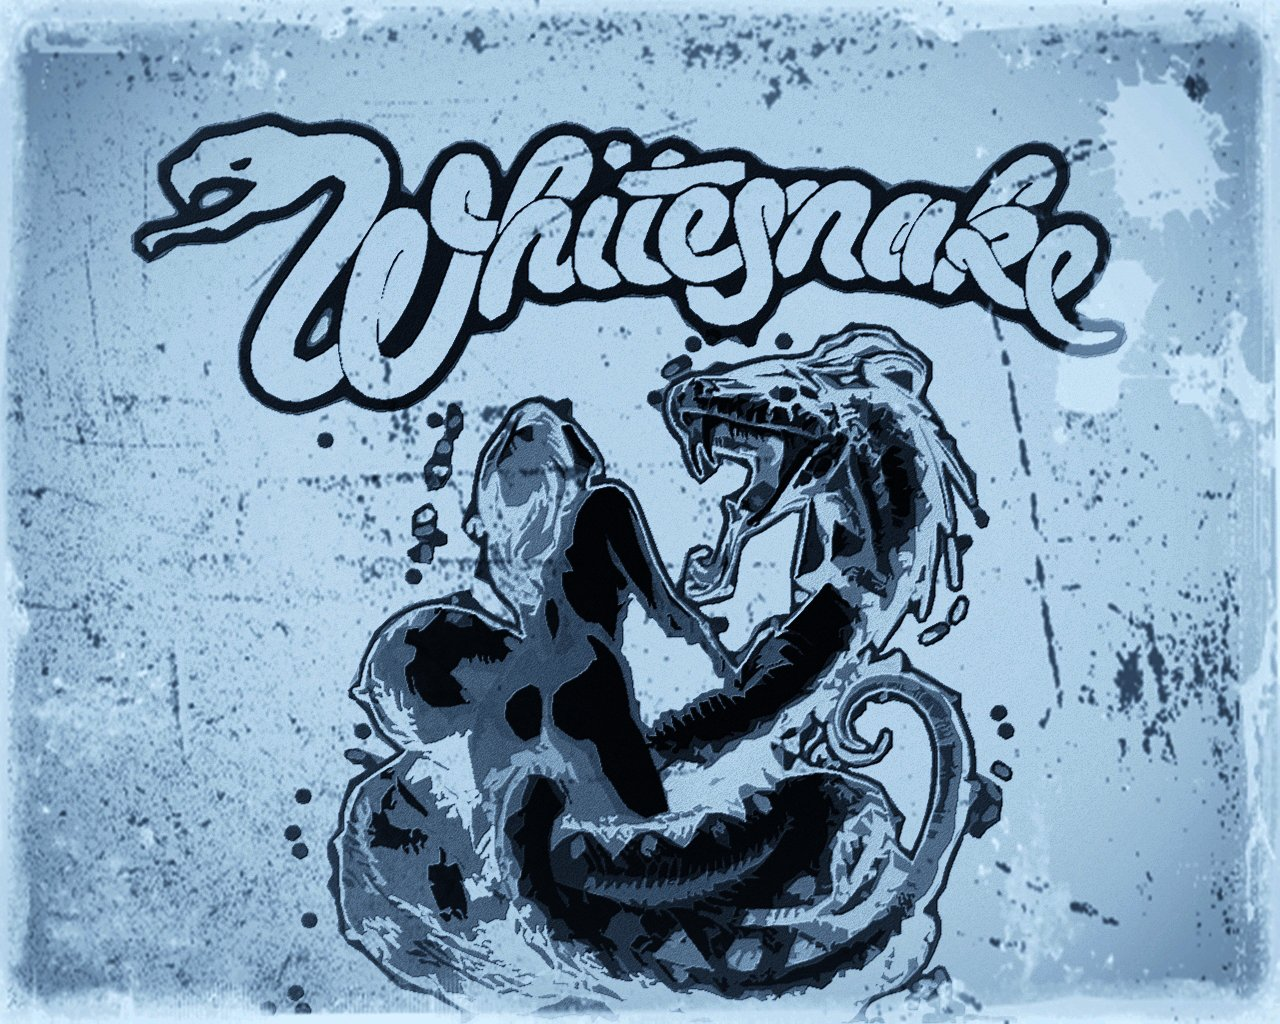 whitesnake lovehunter by krassrocks 1280x1024